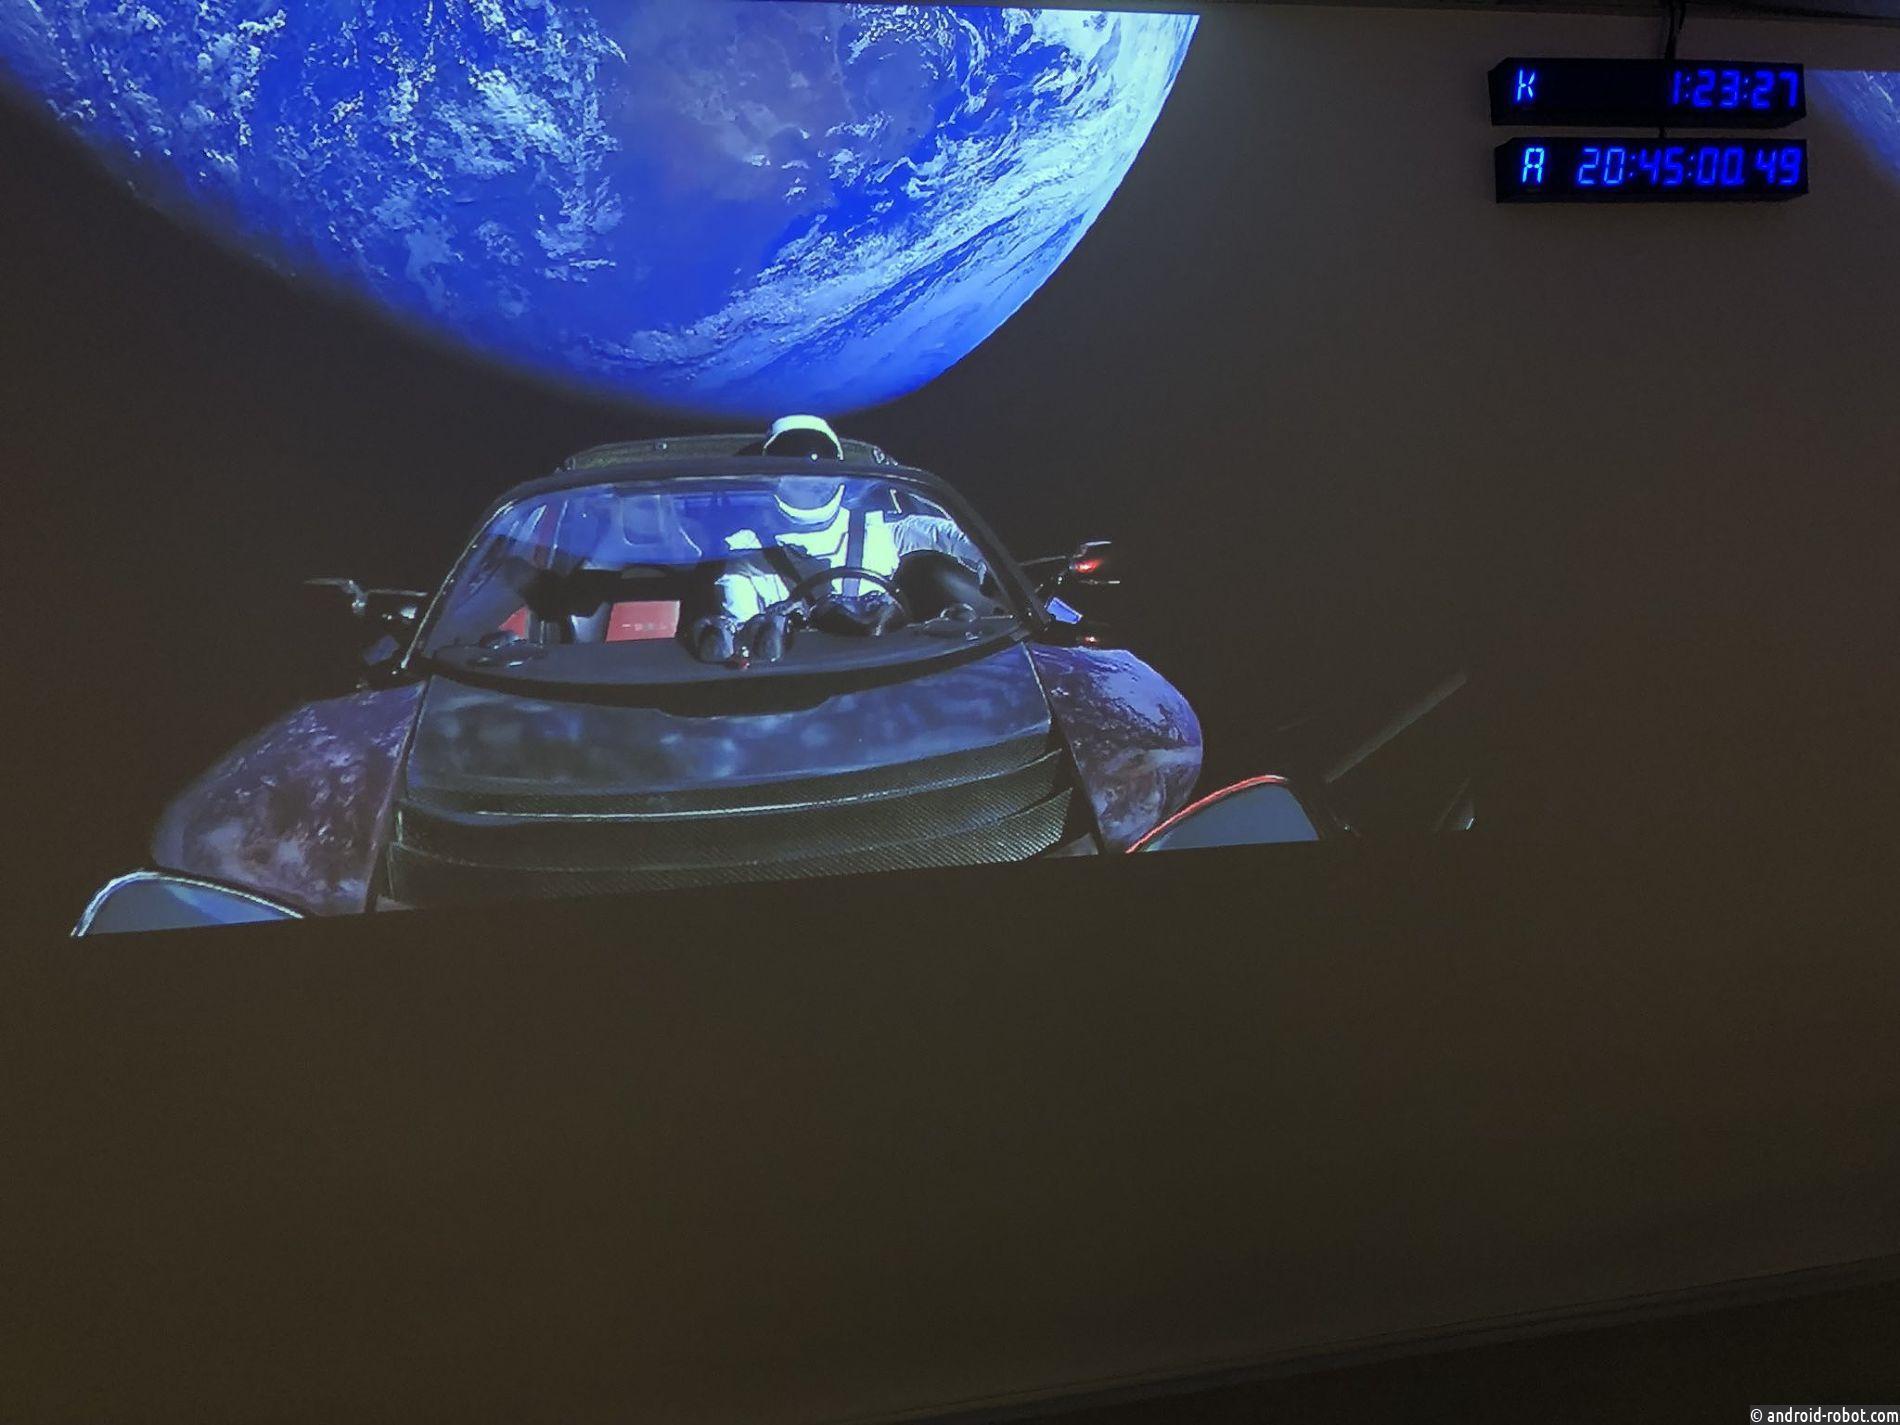 Трансляция запуска ракеты Falcon Heavy стала 2-ой попопулярности вистории YouTube